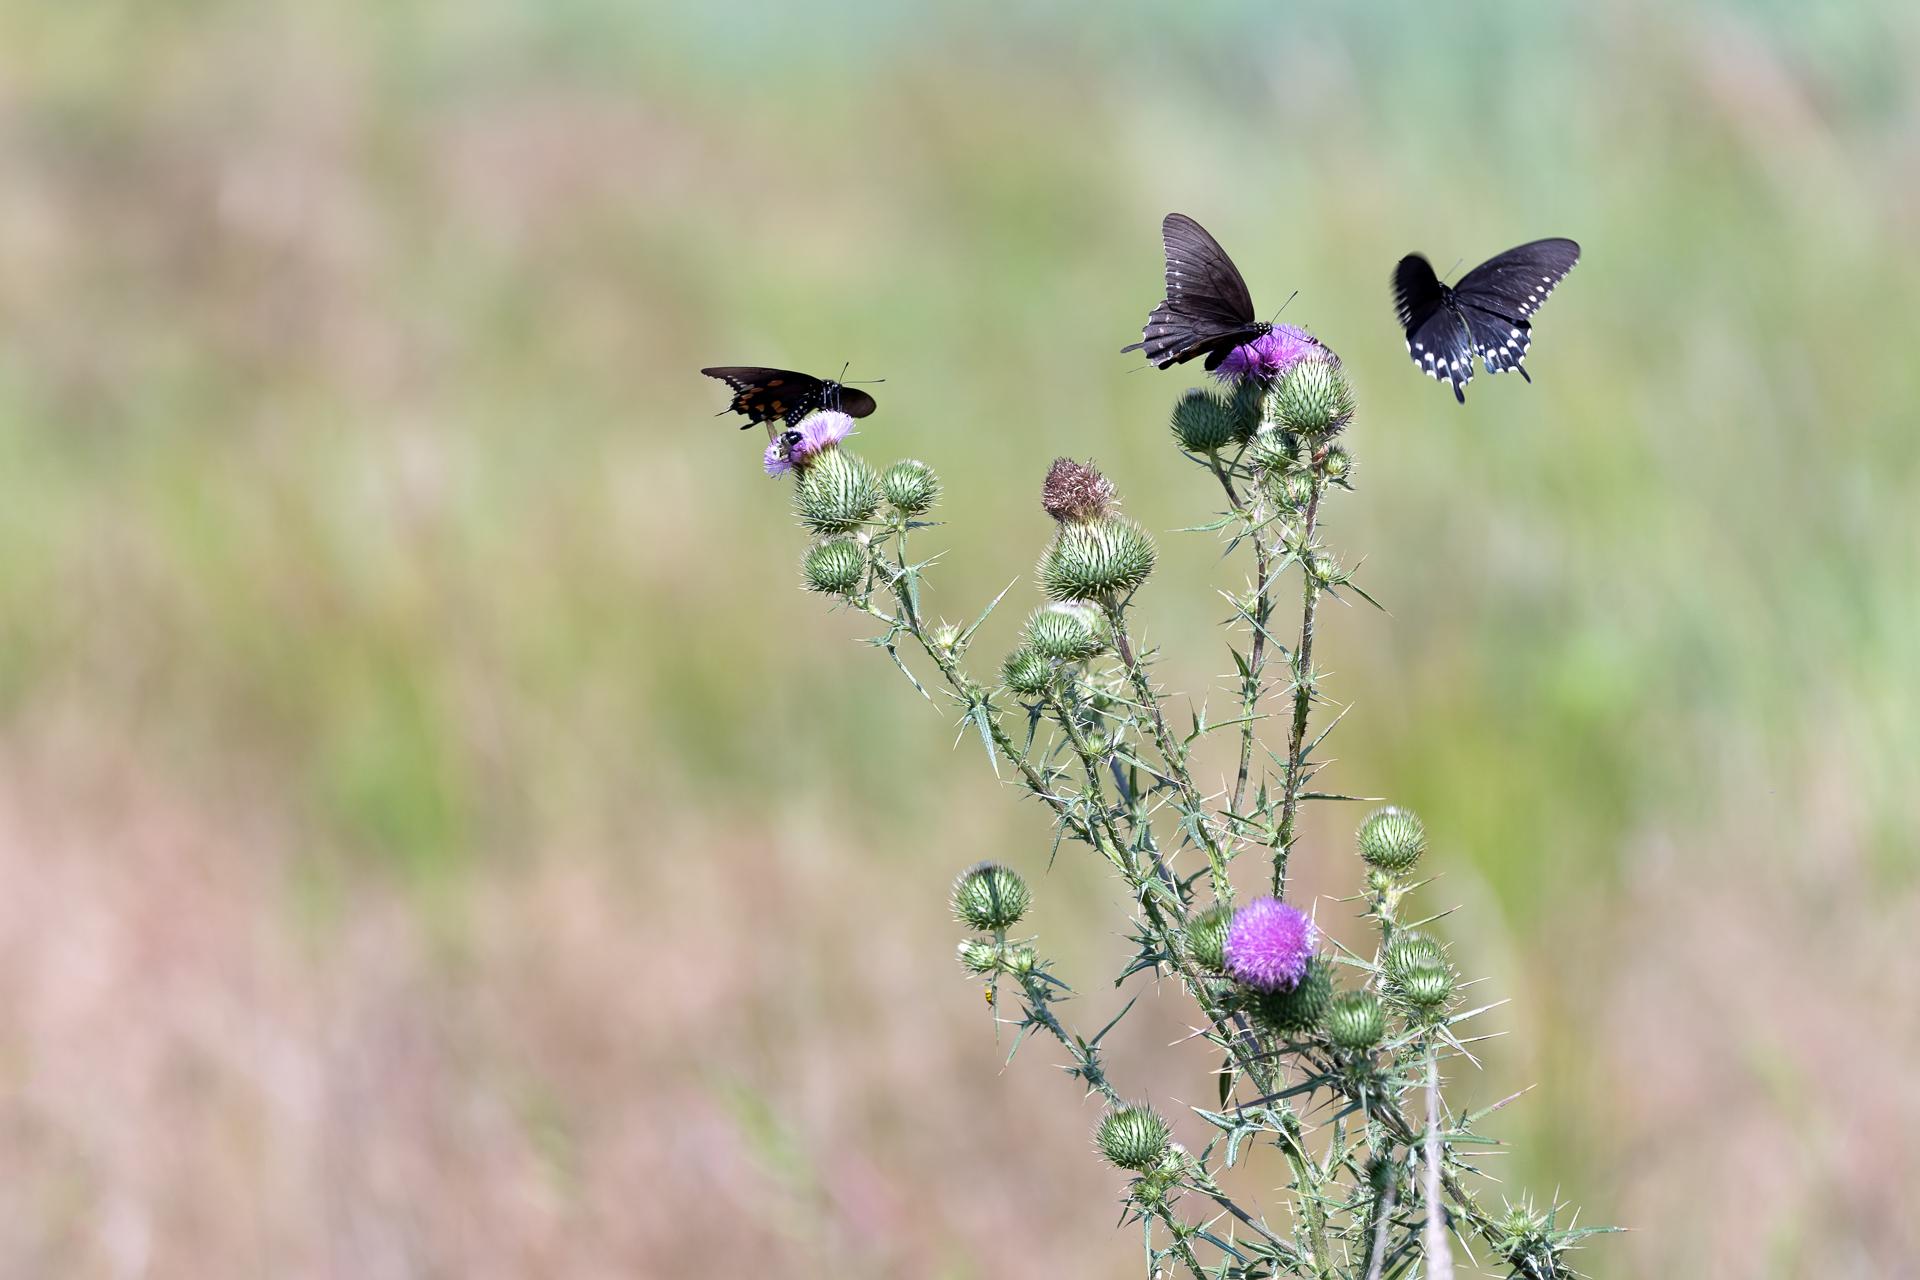 Butterflies-nature-Kathleen-Kathy-Roberts-Asheville-NC-Photographer-2.jpg